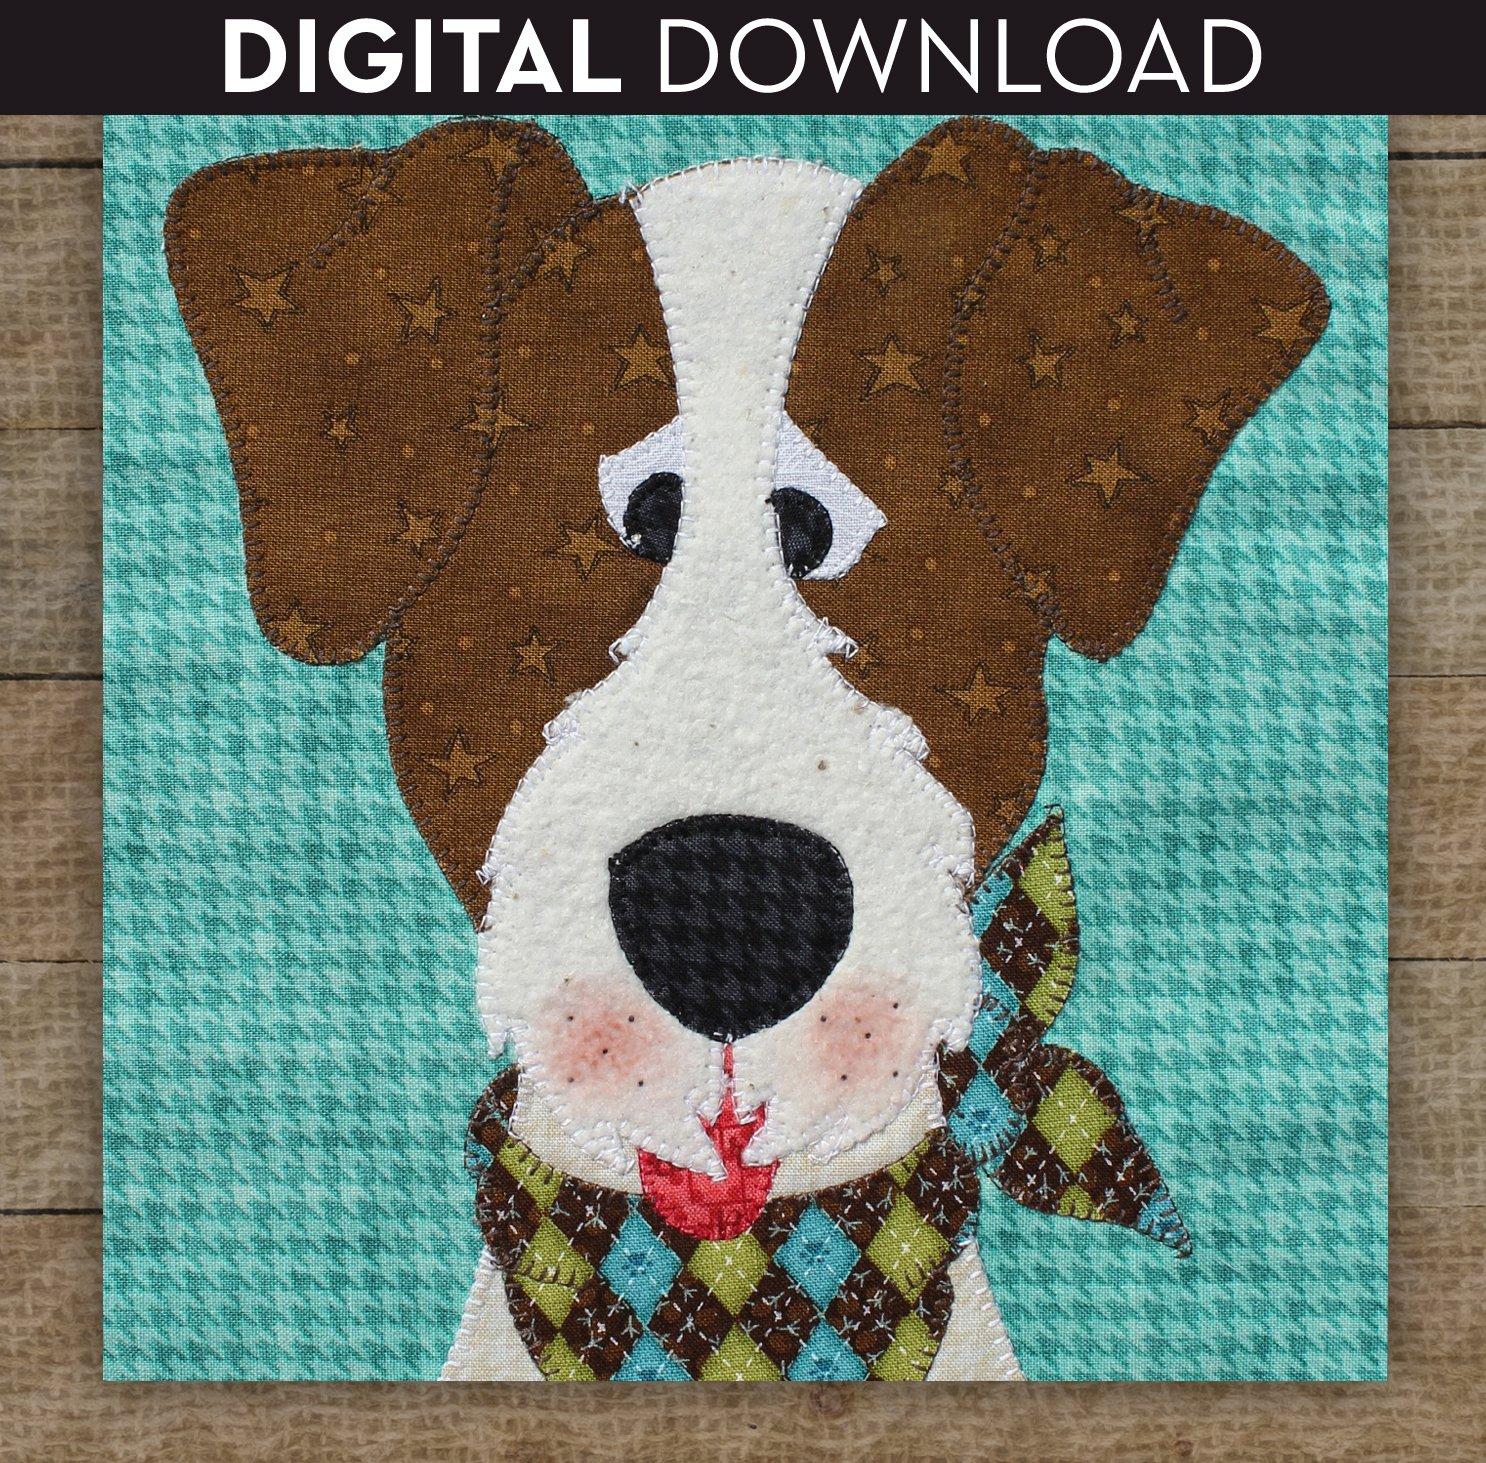 Jack Russell Terrier - Download